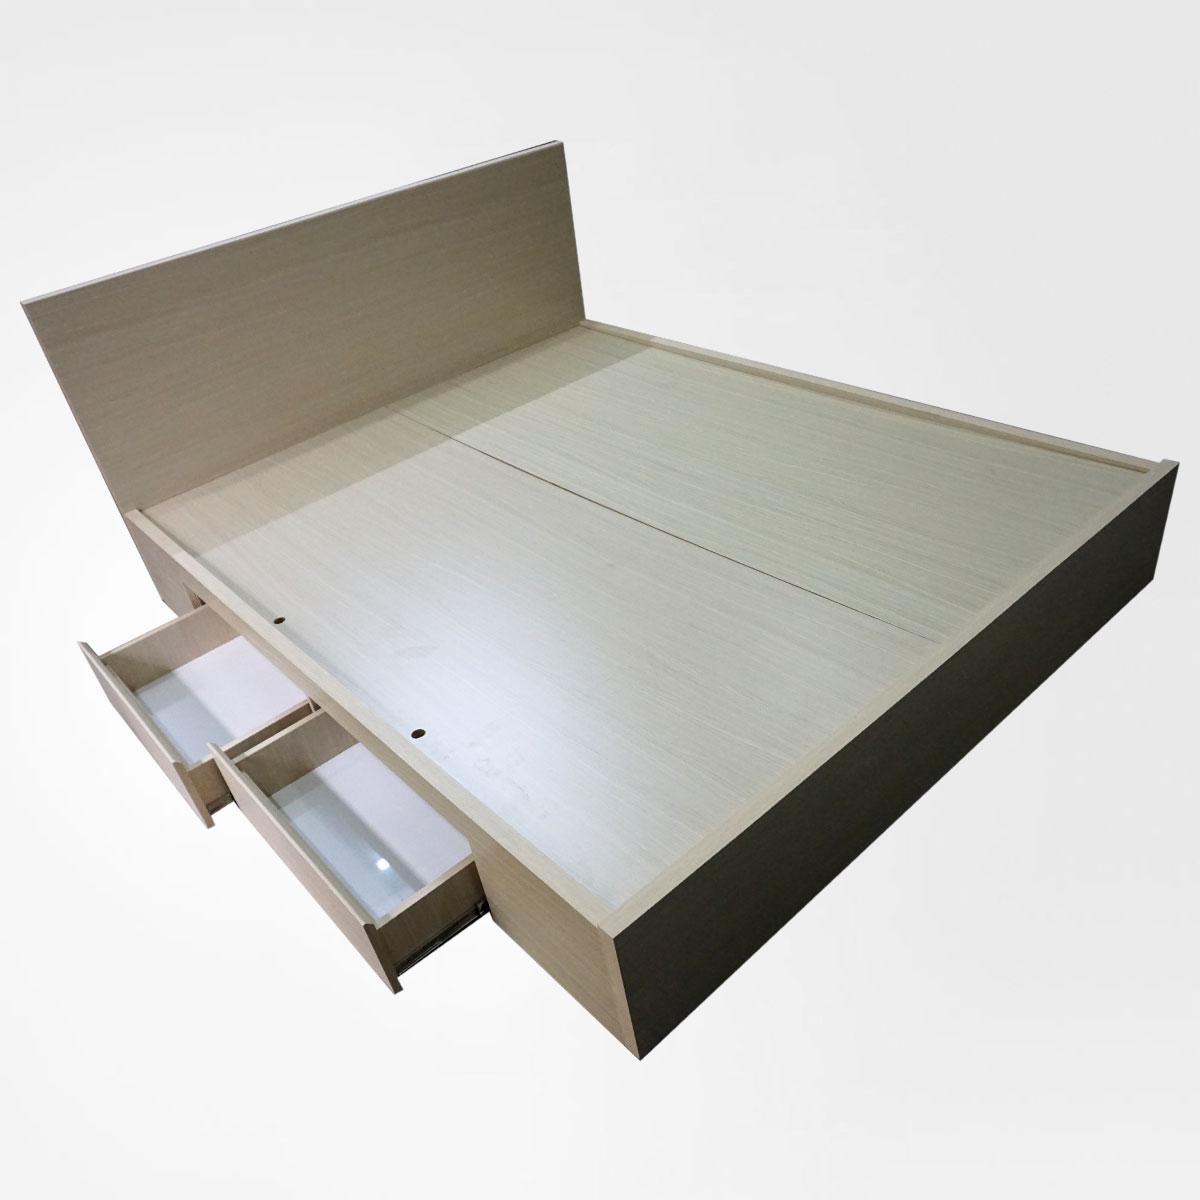 Giường ngủ MDF phủ melamine 2 hộc kéo